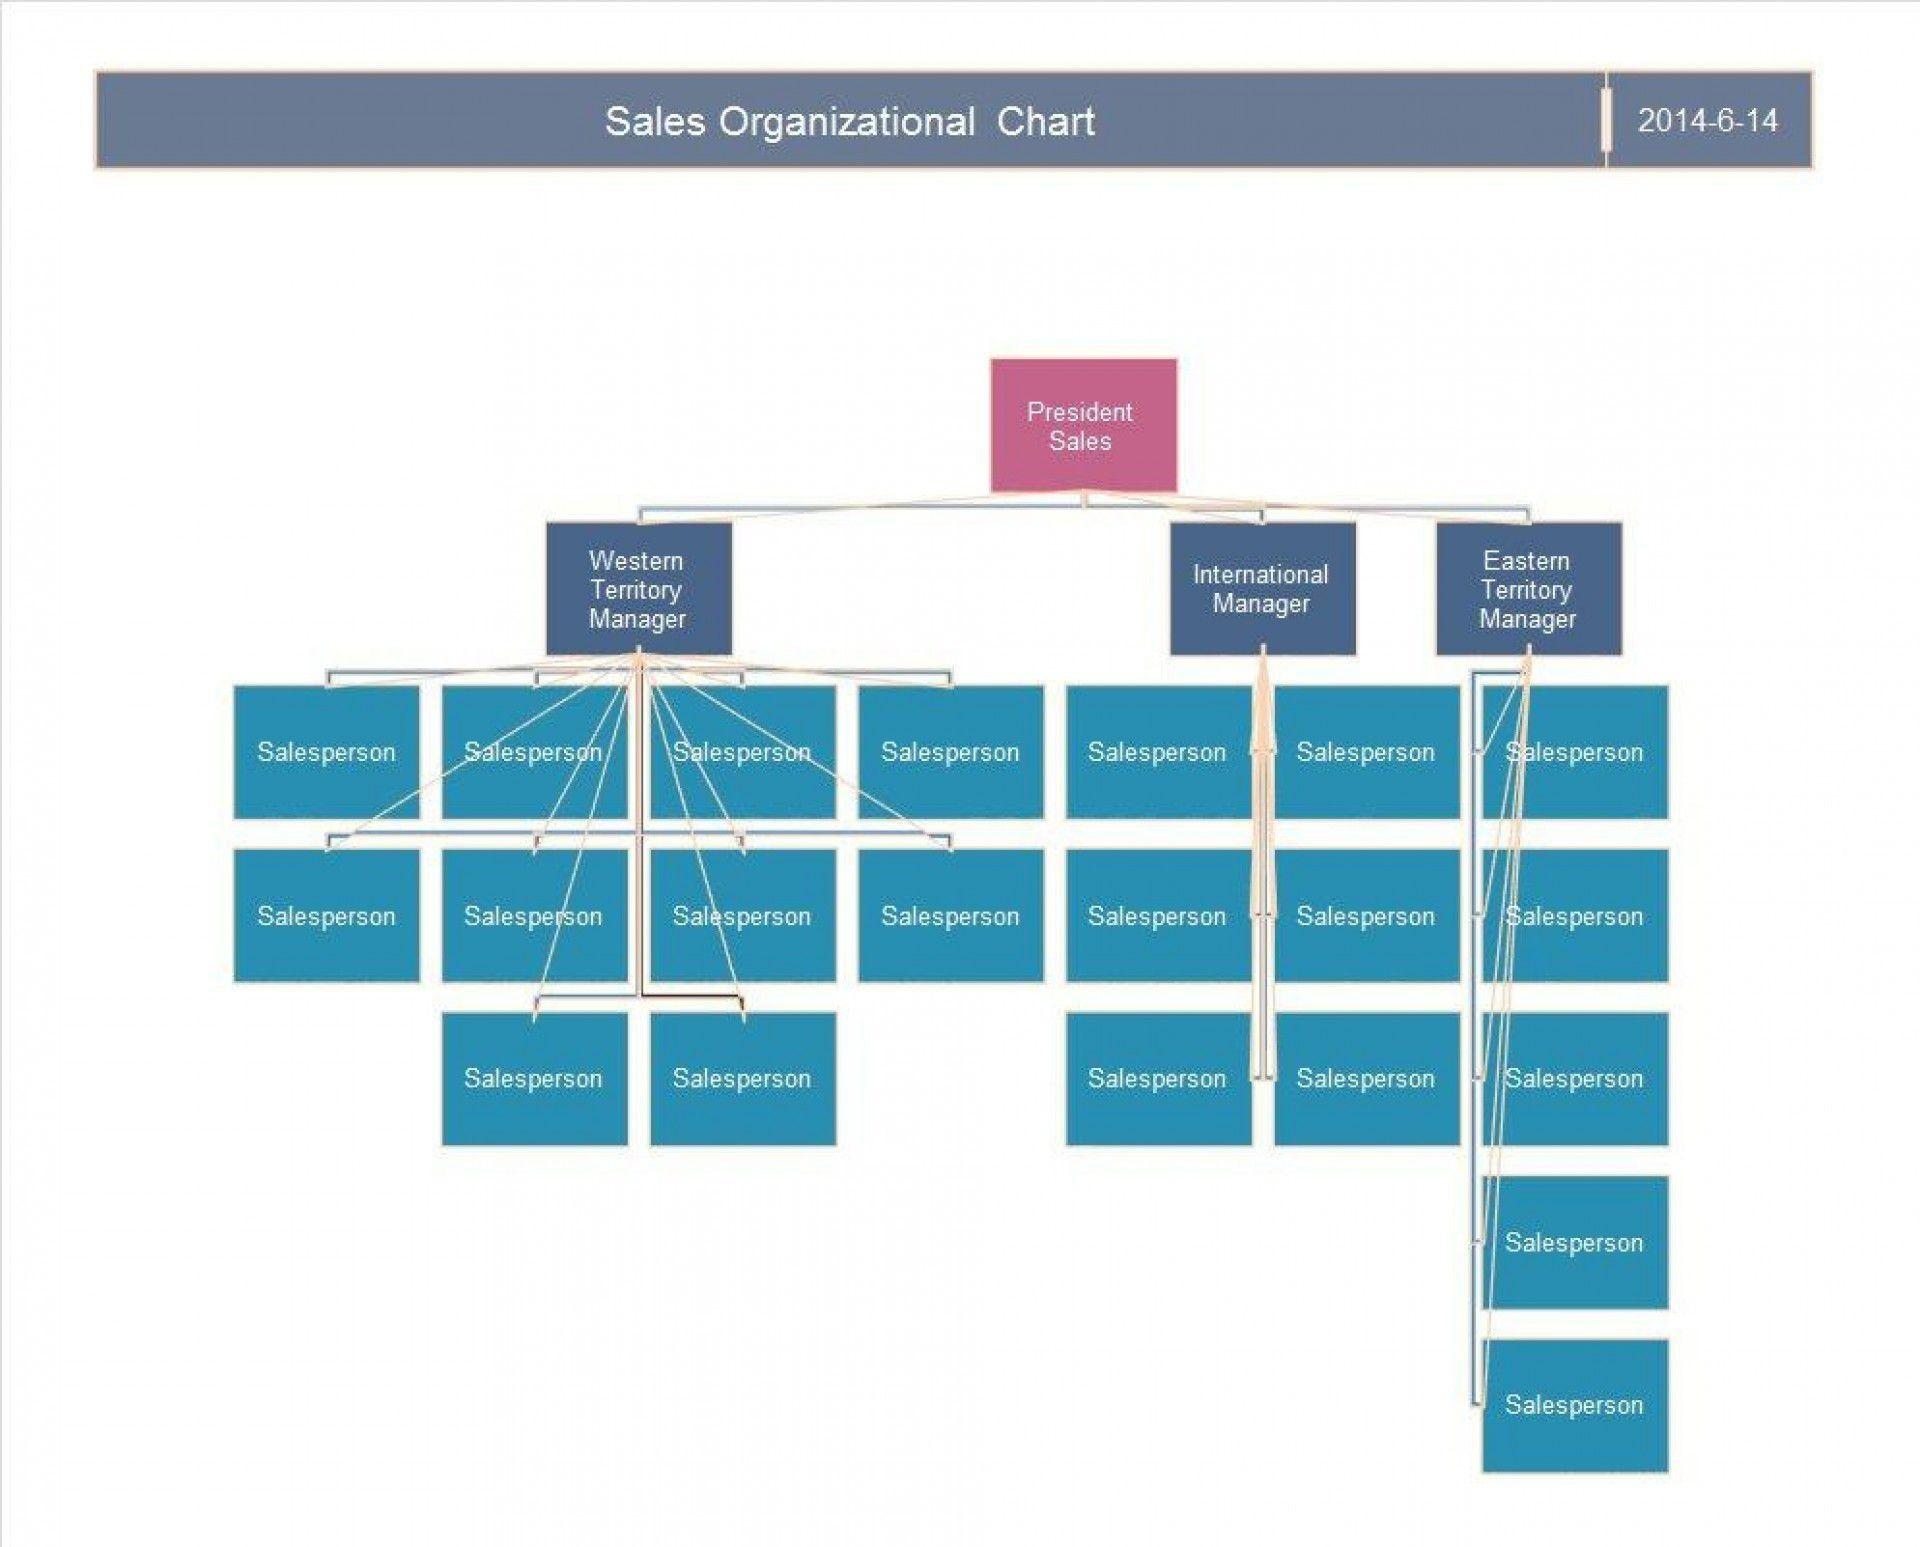 005 Striking Organization Chart Template Word 2013 Design  Organizational Free Microsoft1920